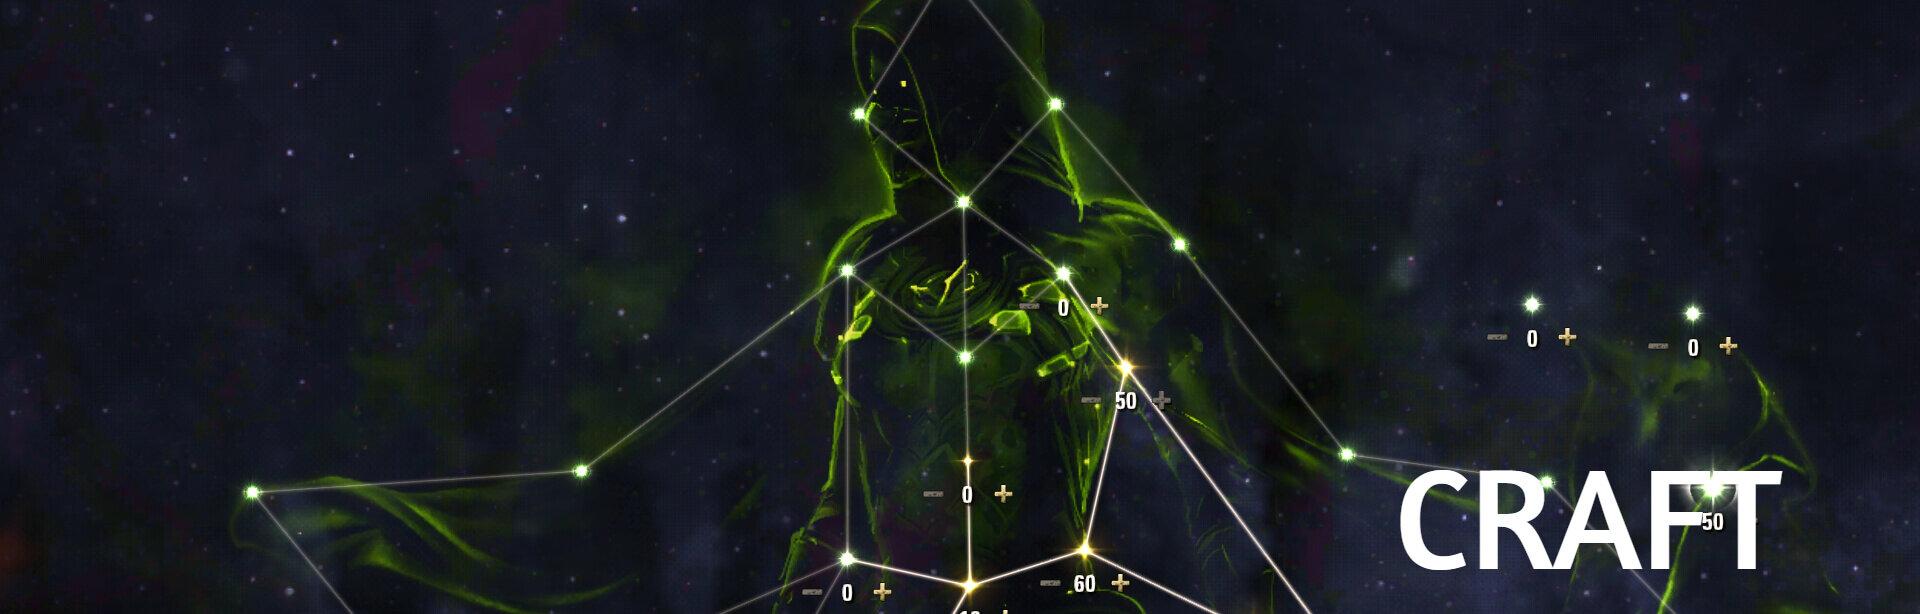 eso-craft-constellation.jpg